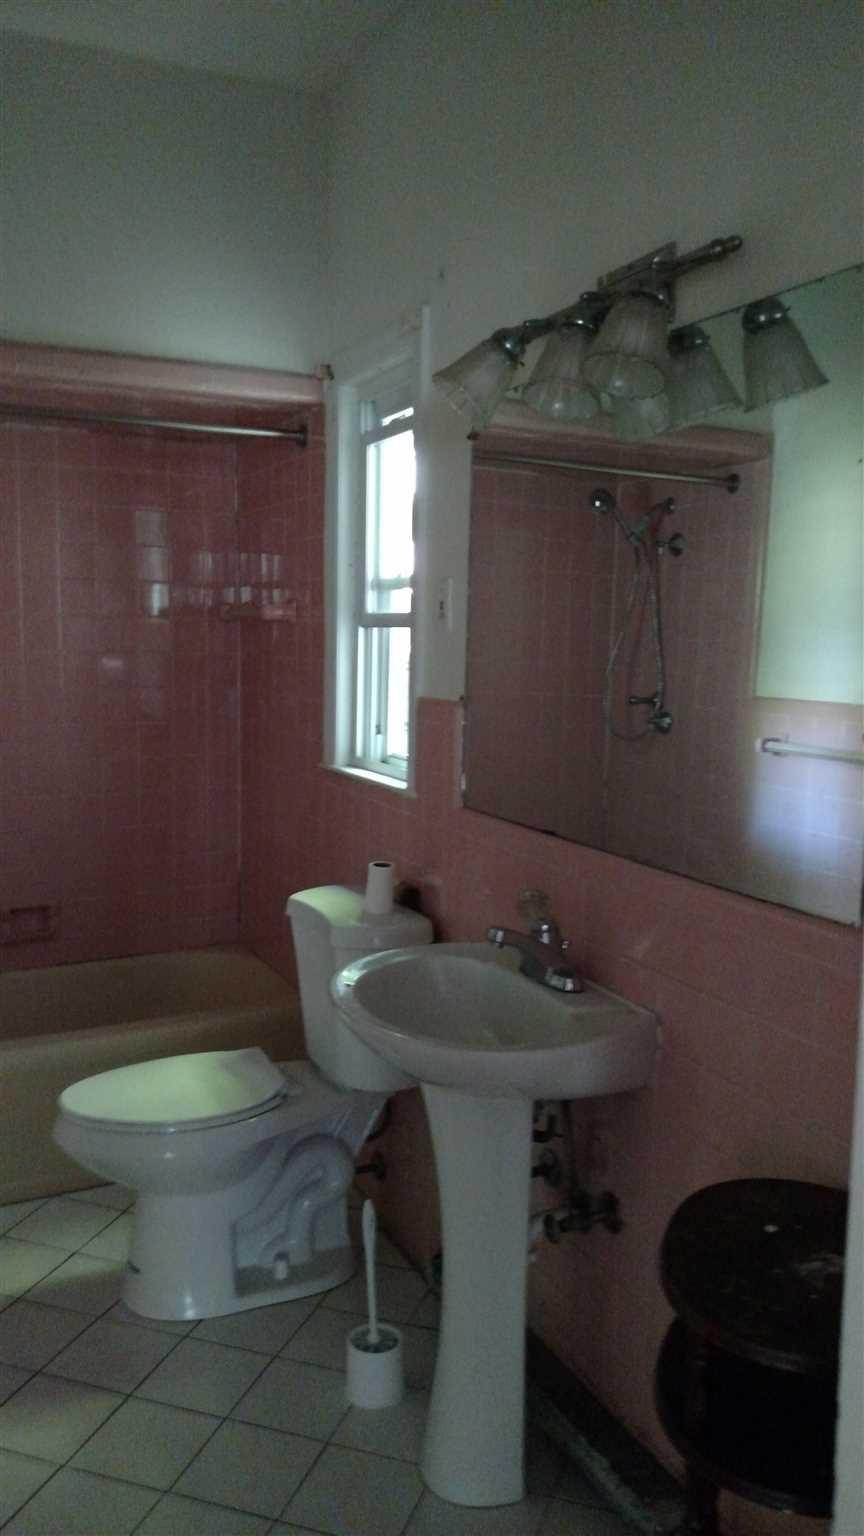 Additional photo for property listing at 81 MARKET Street 81 MARKET Street Poughkeepsie, New York 12601 United States